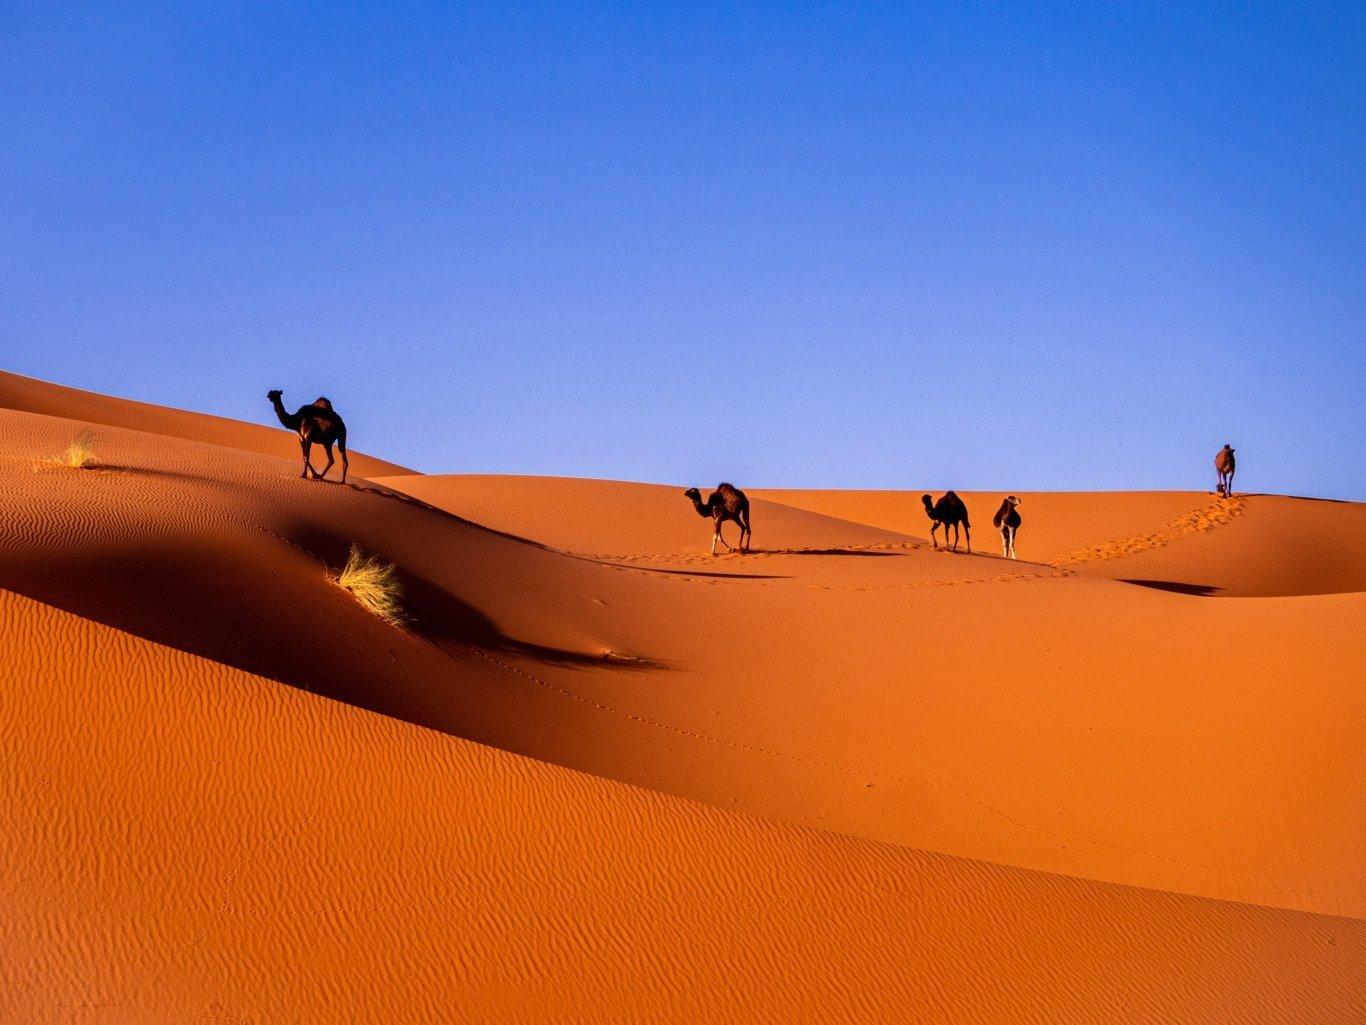 3-Day Sahara Desert Tour from Marrakesh - Morocco Itinerary